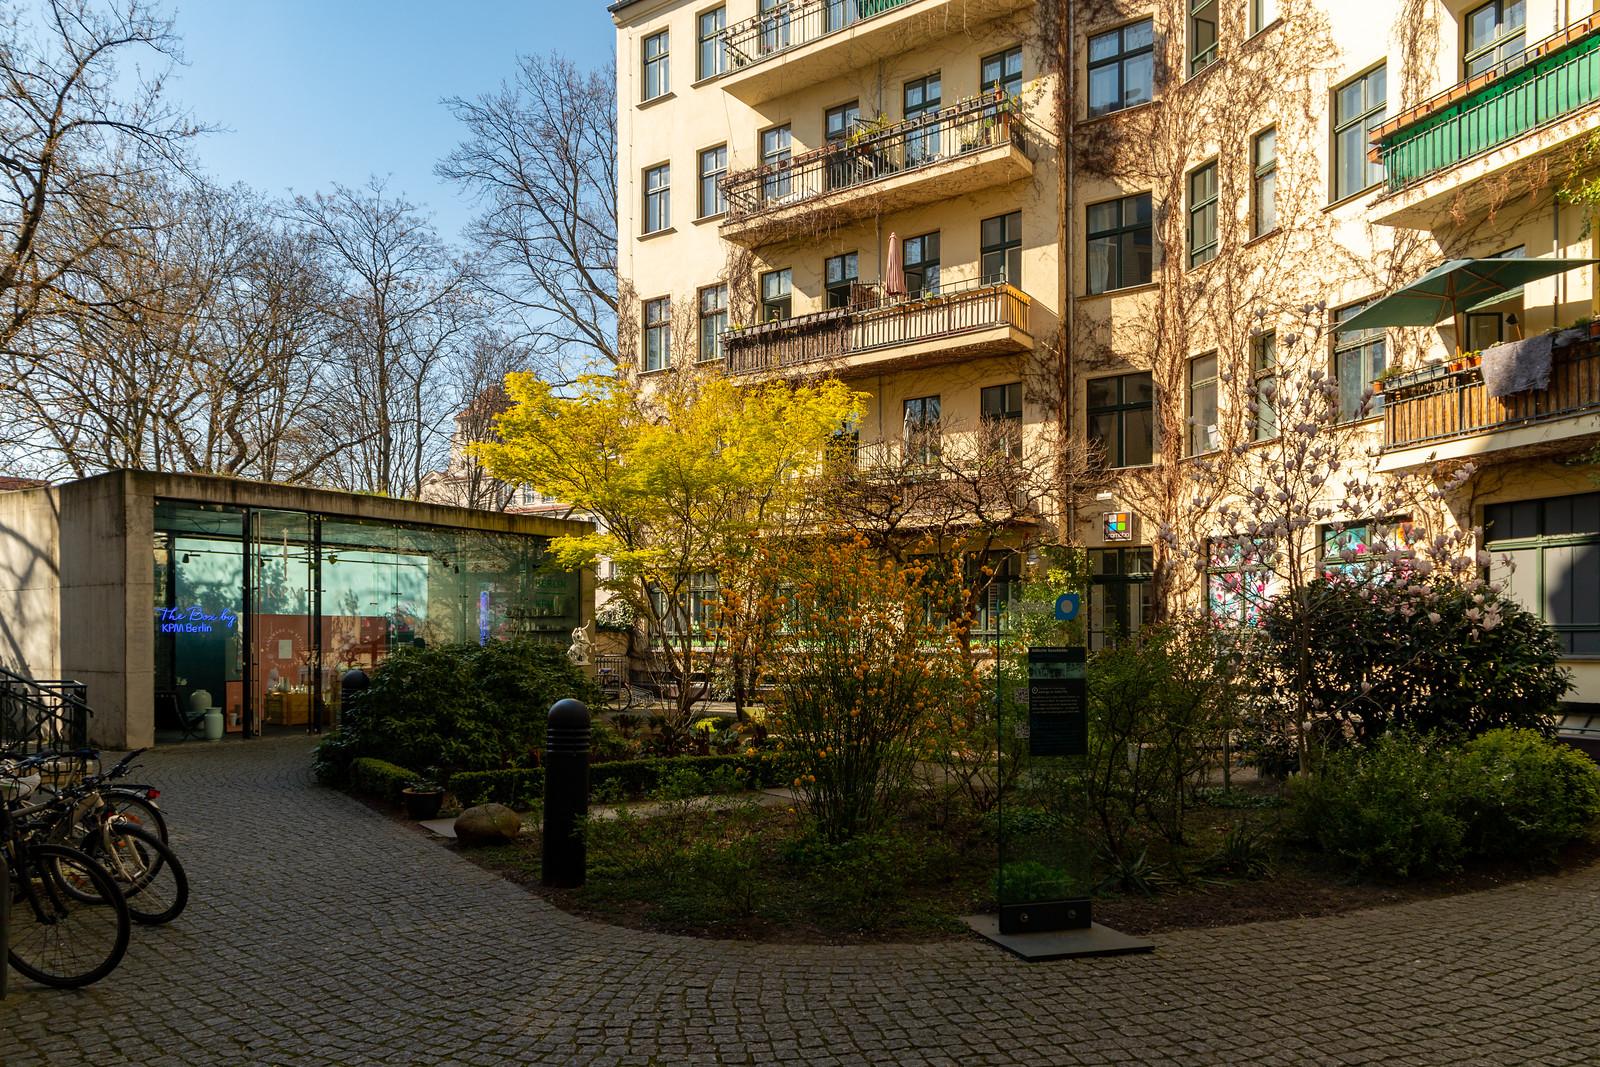 Hackesche Höfe - Kunsthof